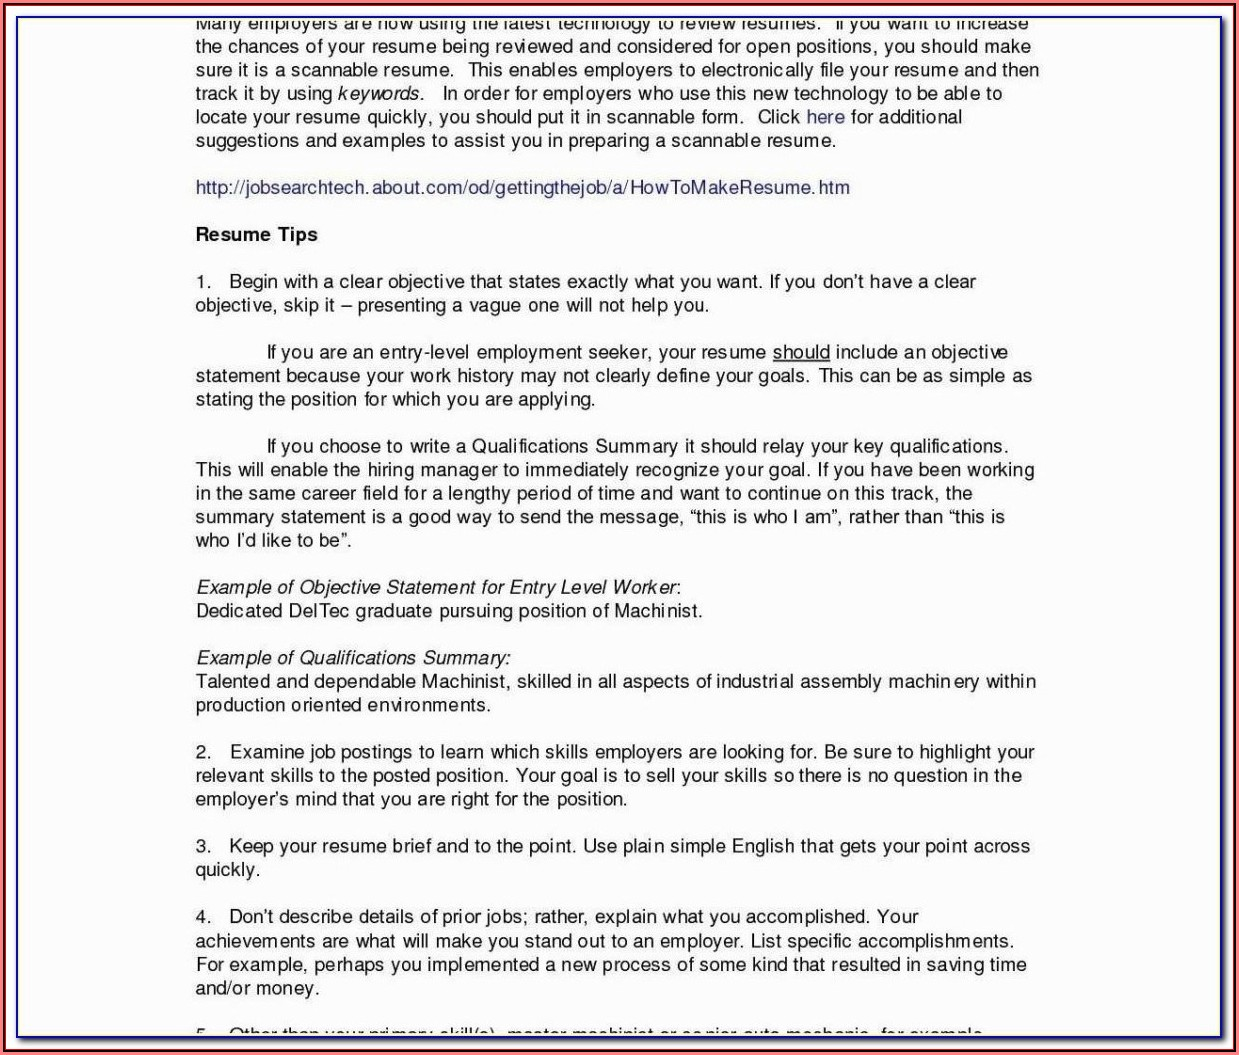 Federal Resume Writing For Veterans